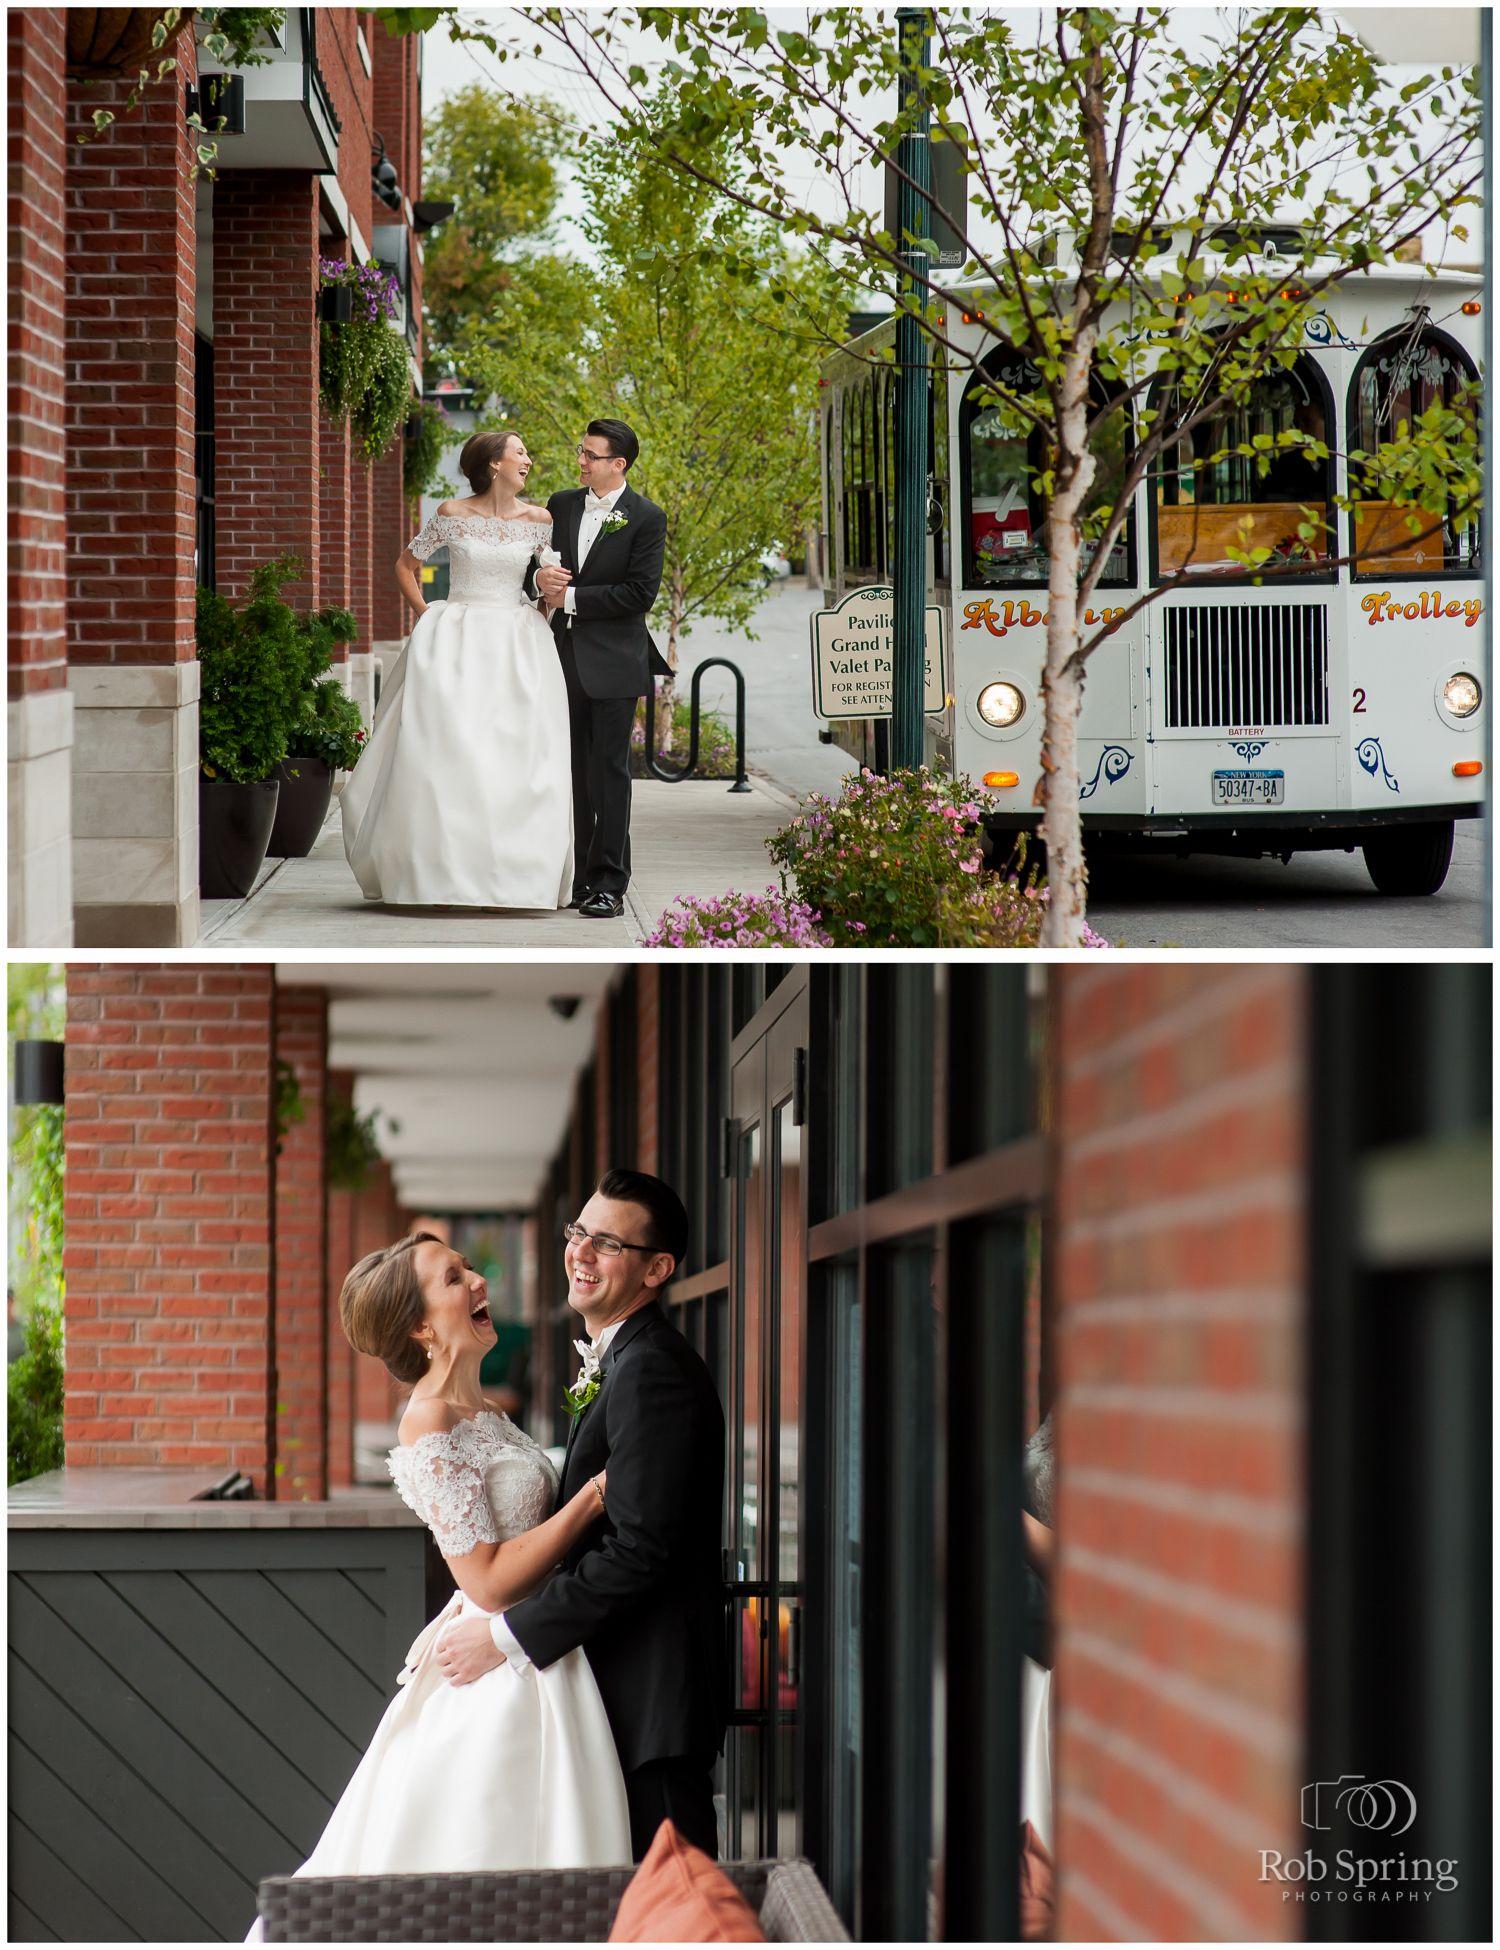 Wedding Photos With Albany Trolley Pavilion Grand Hotel Saratoga